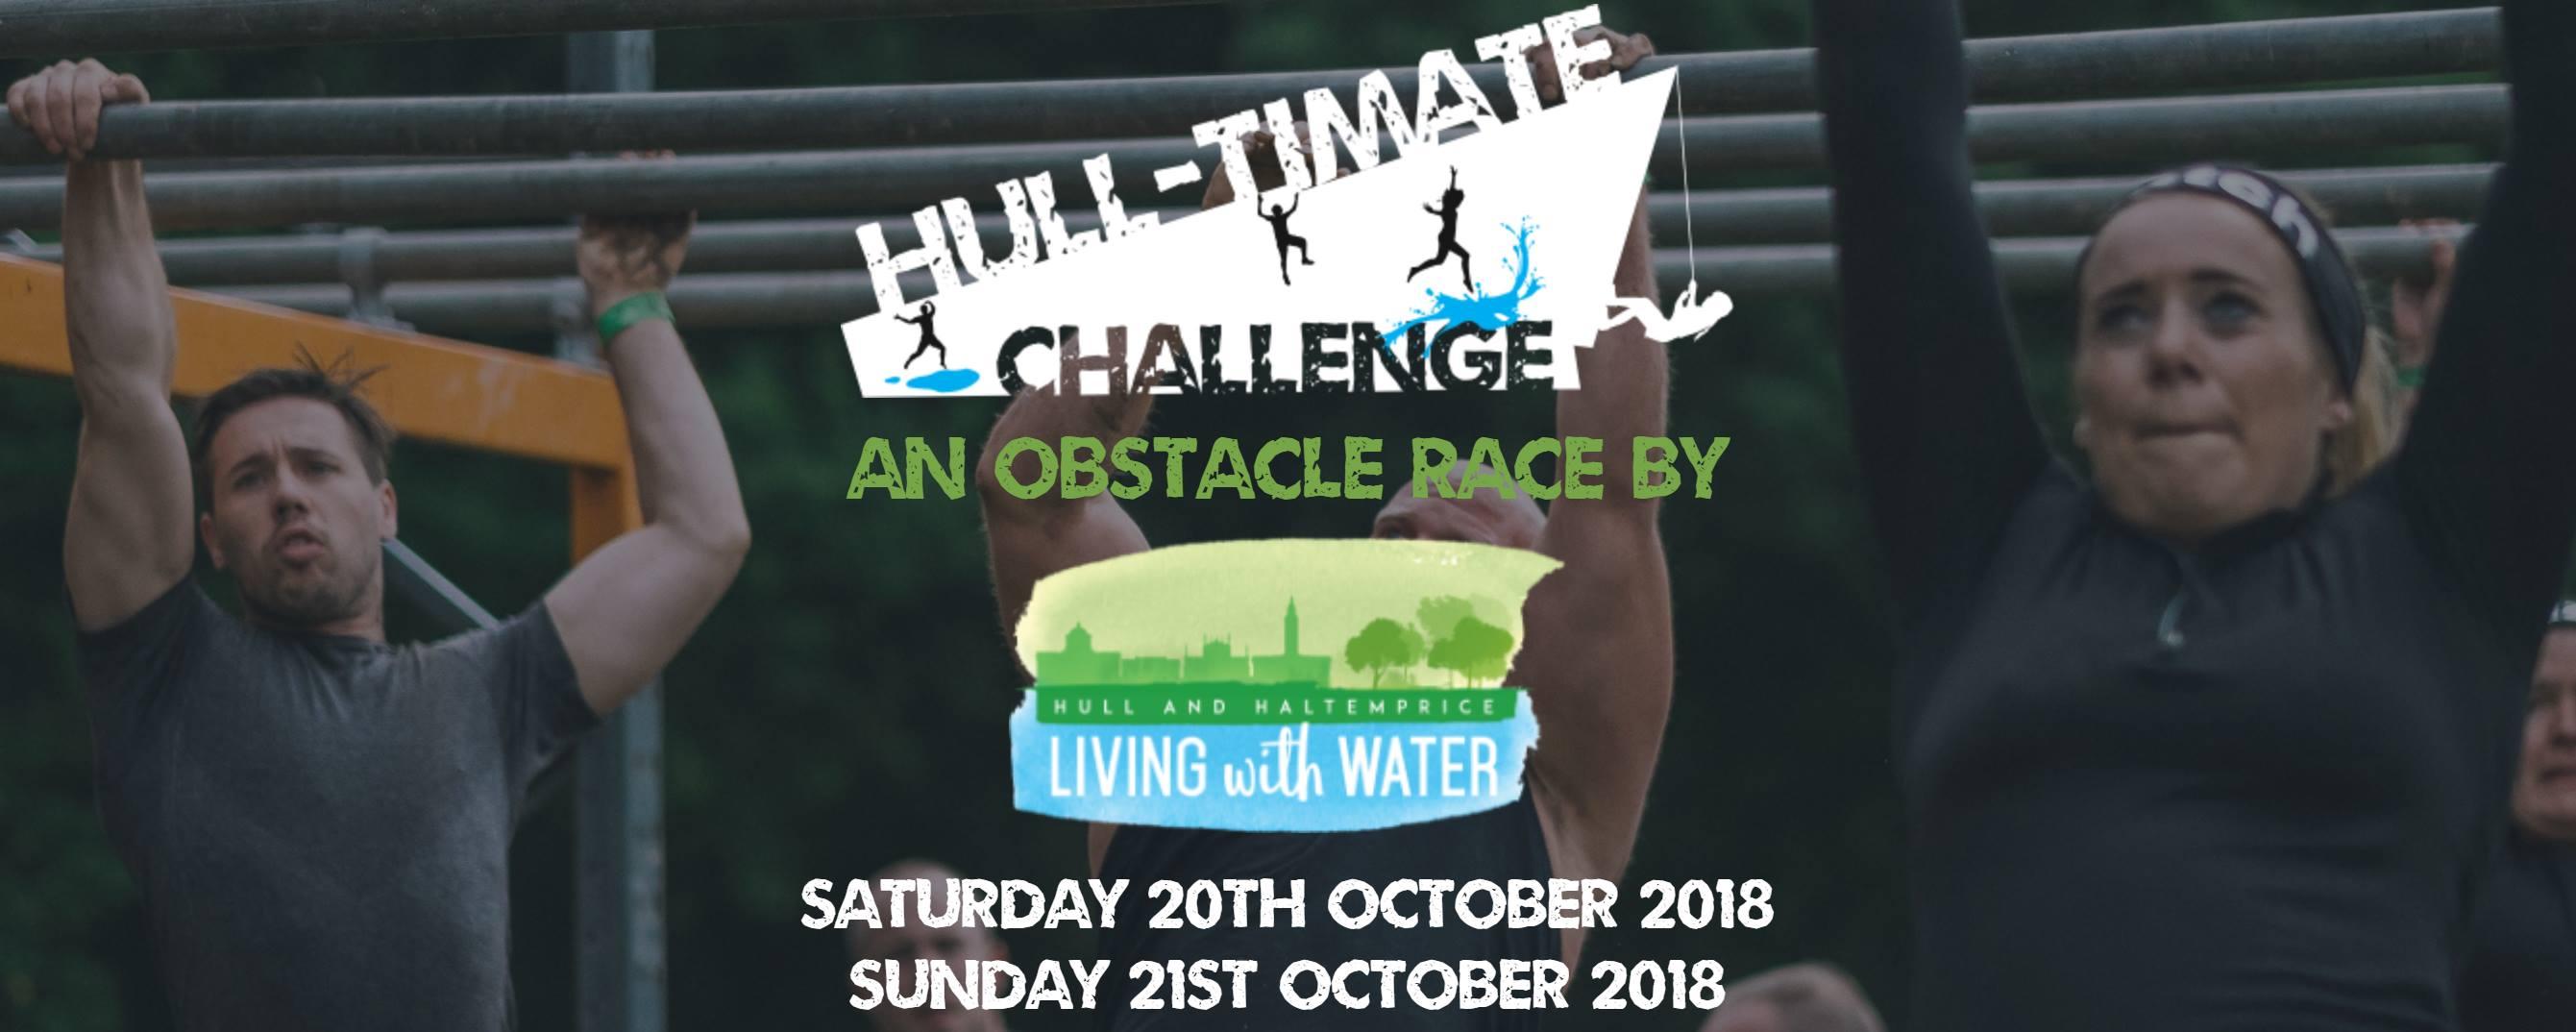 Hull-timate Challenge